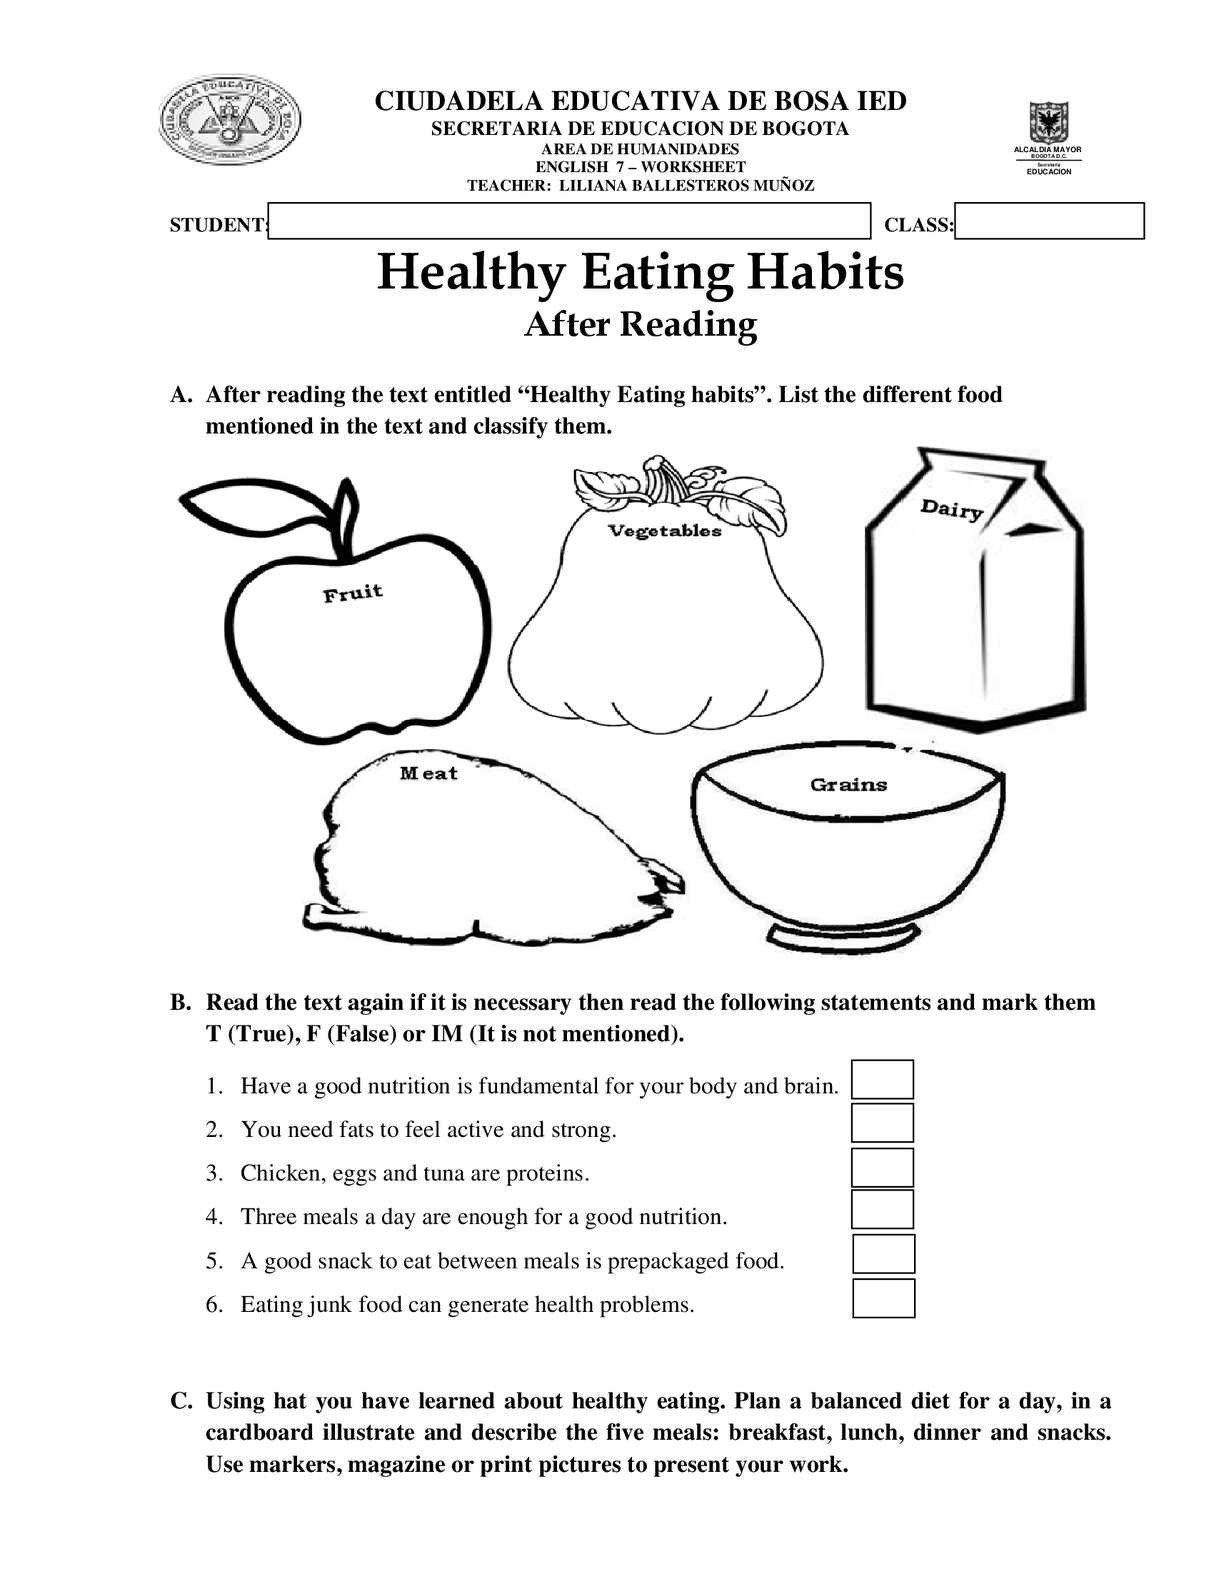 Halloween Nutrition Worksheets Nursery Homework Sheets Second Grade Science  Worksheets   Halloween worksheets free [ 1584 x 1224 Pixel ]